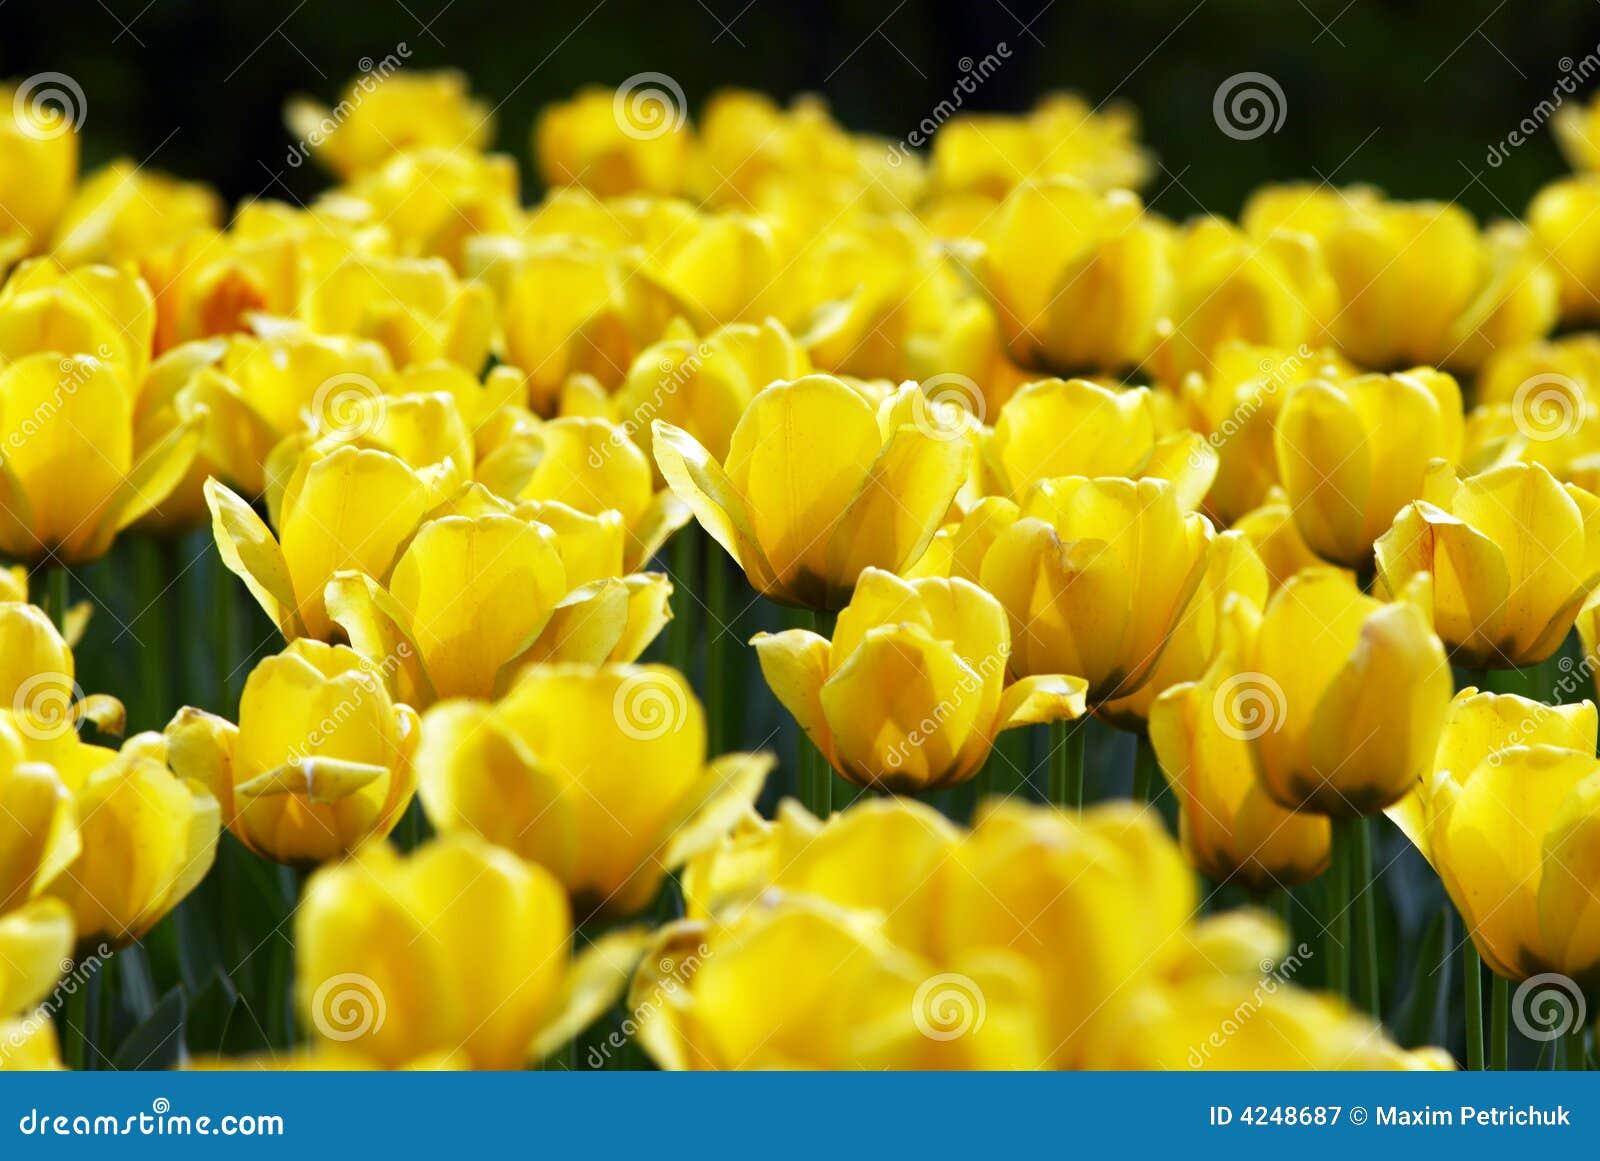 De gele tulp bloeit gebied